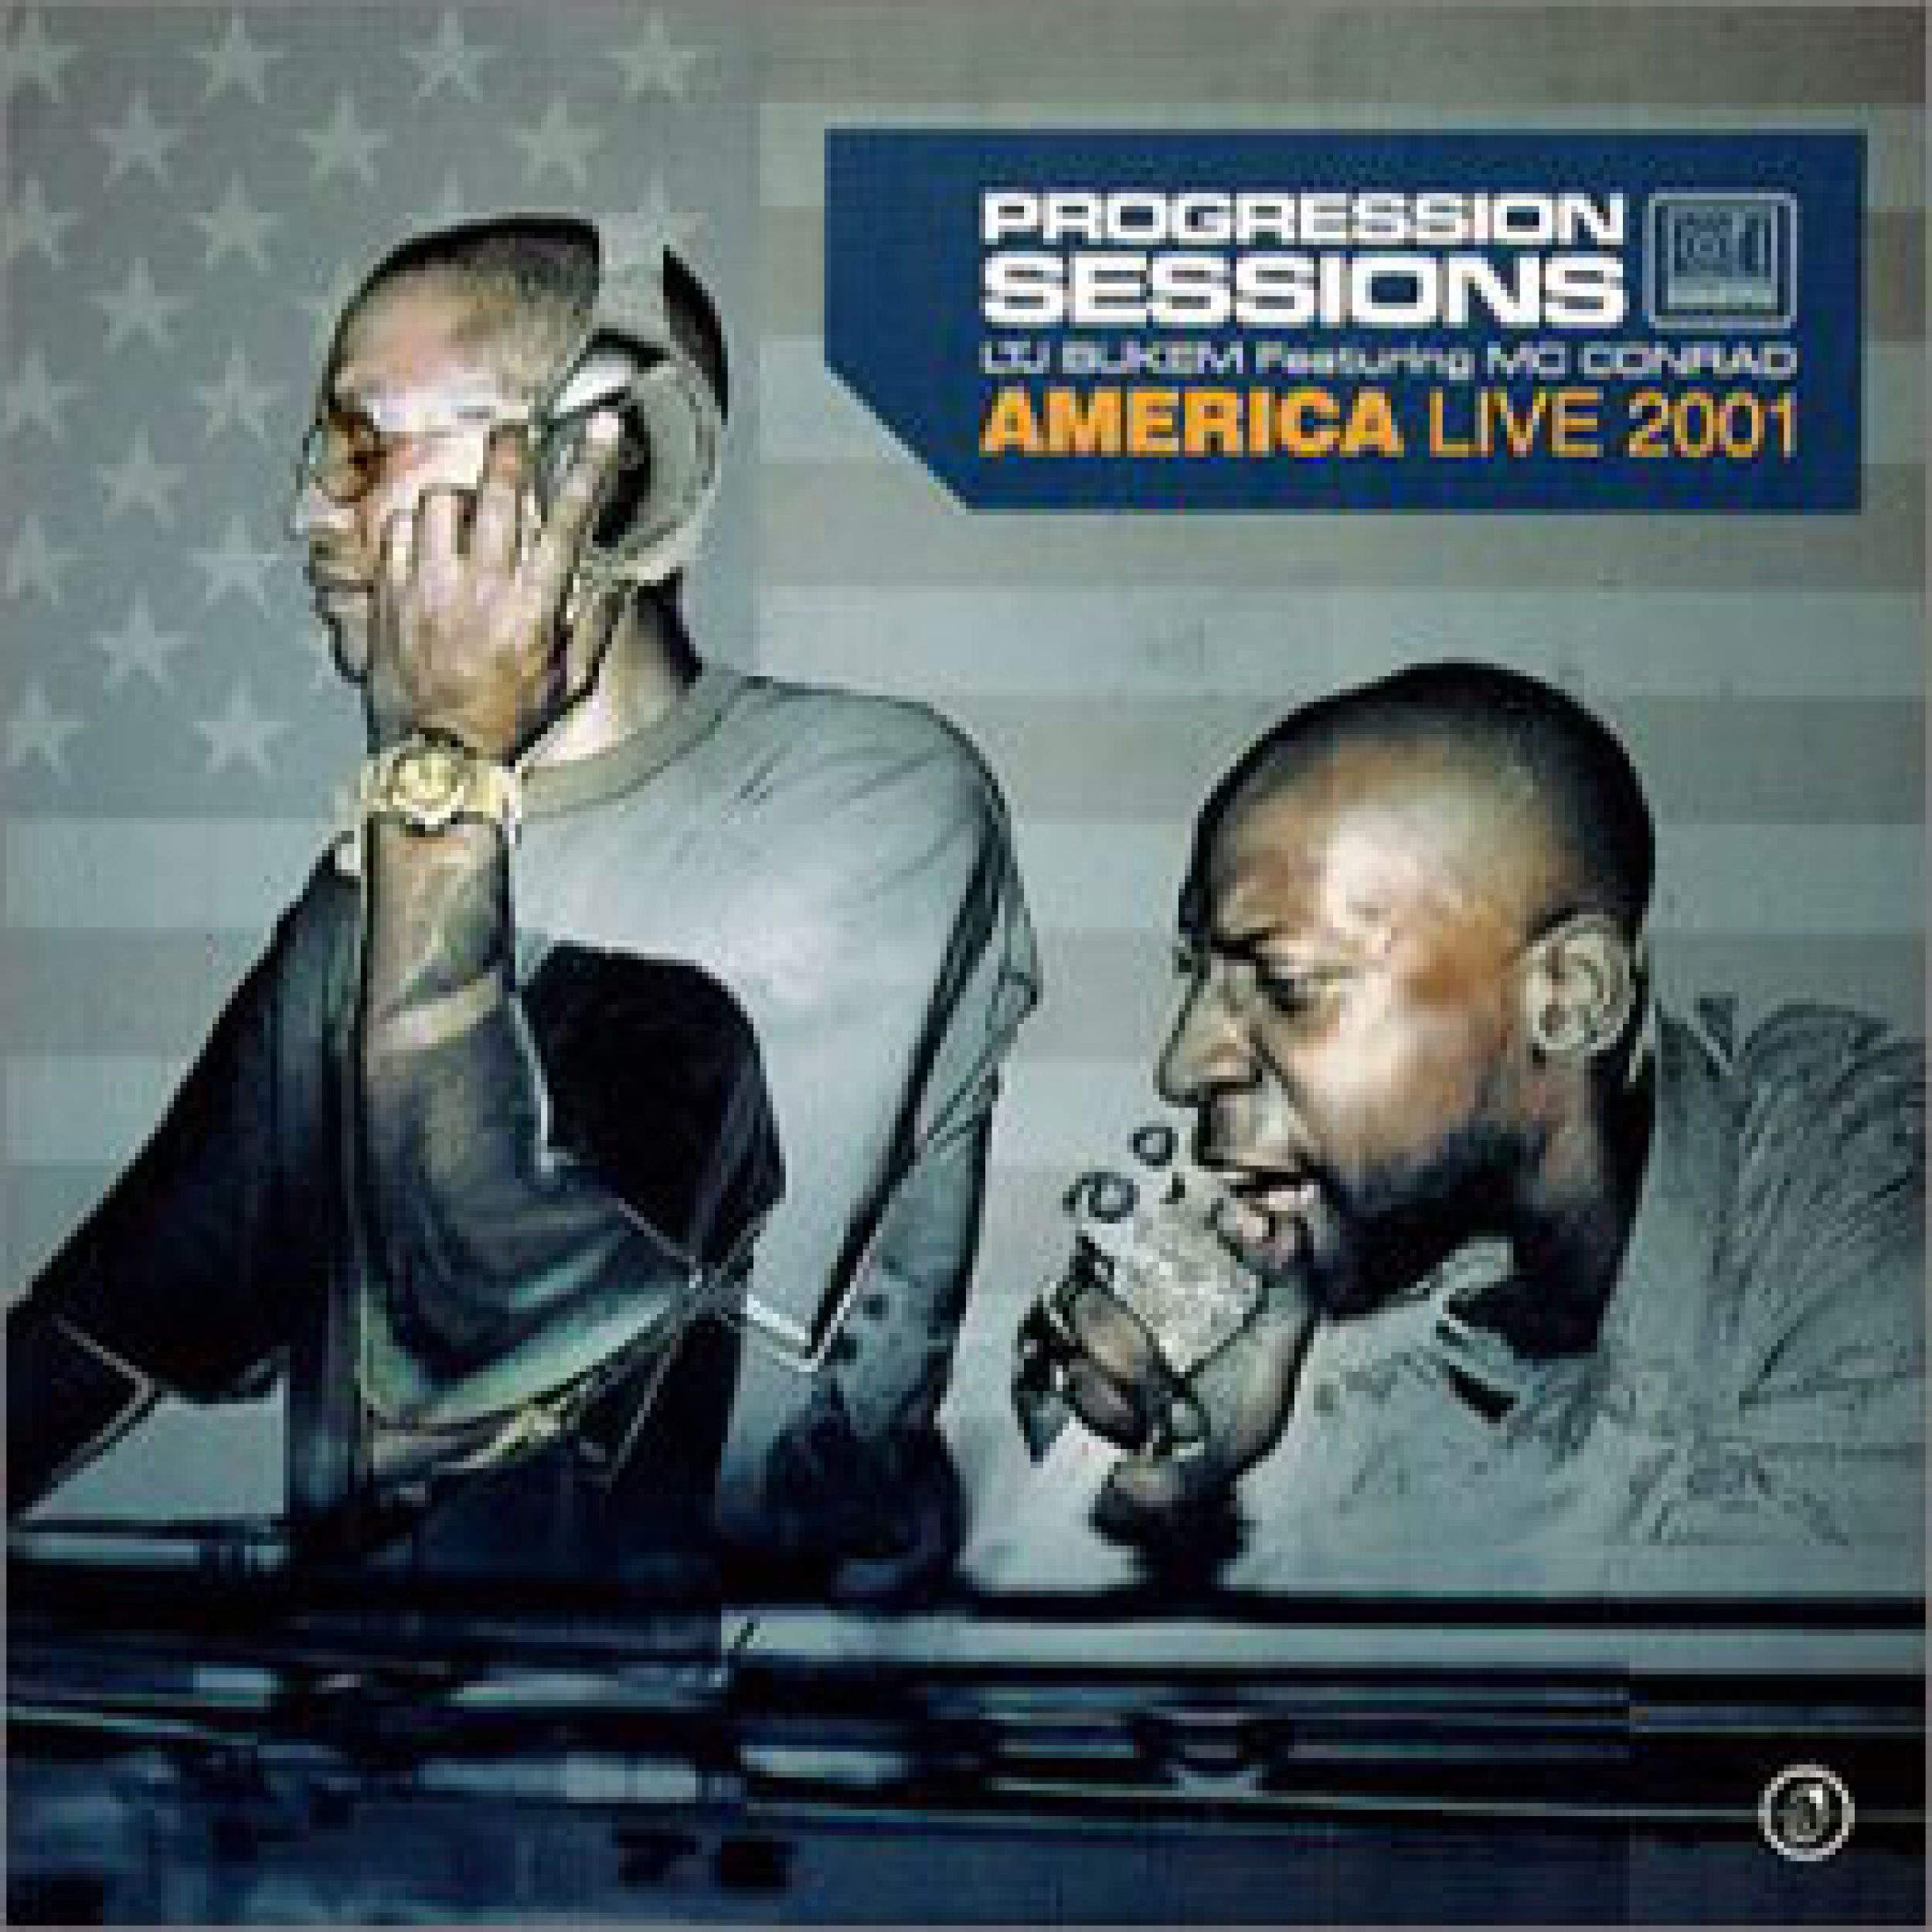 LTJ_Bukem_feat._MC_Conrad_-_Progression_Sessions_6_-_America_Live_2001.jpg